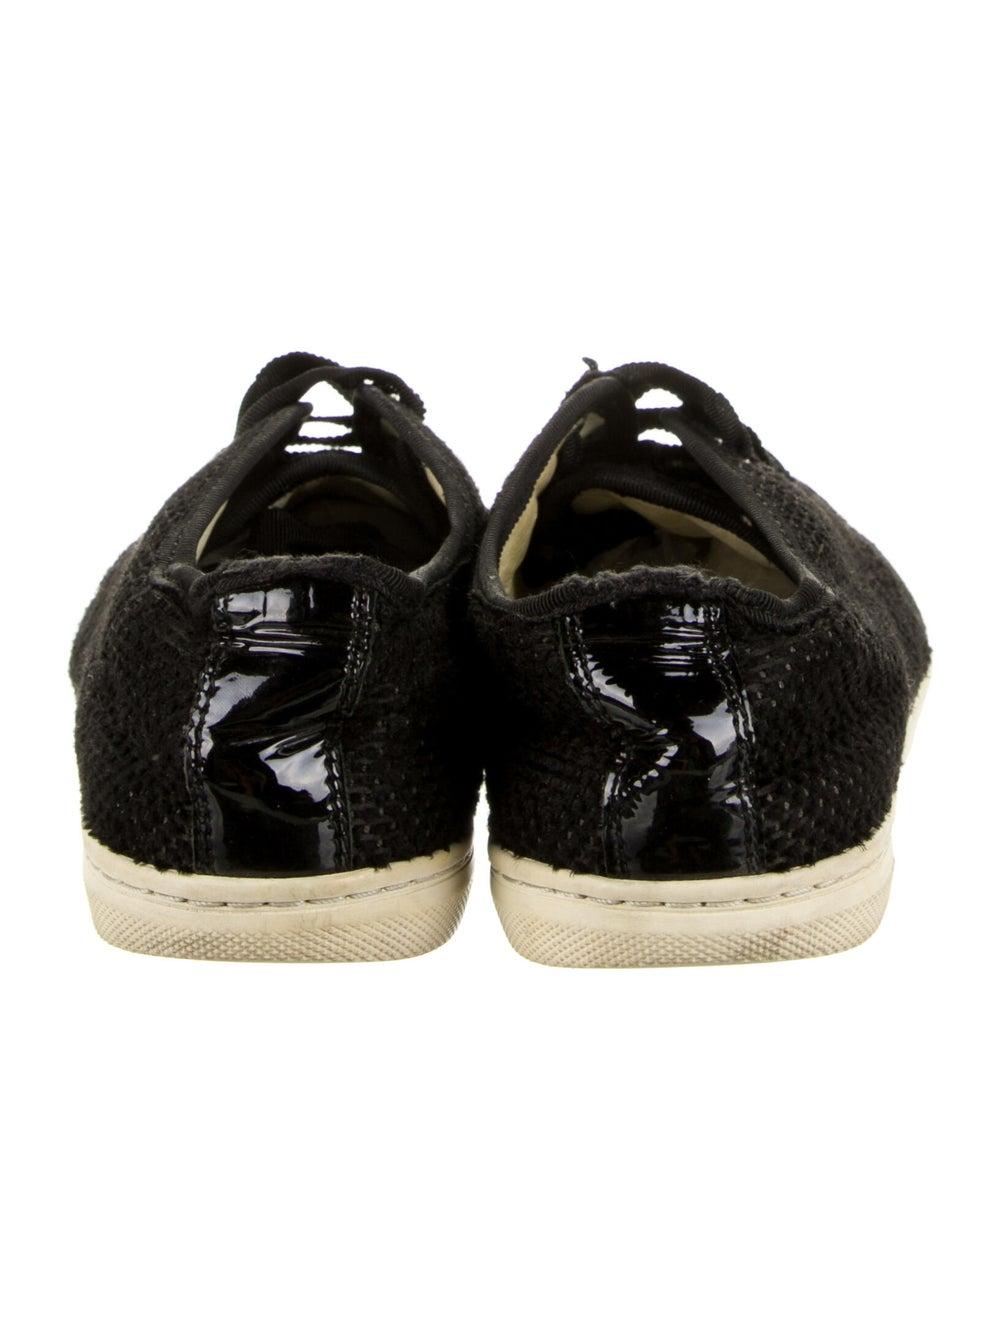 Lanvin Sneakers Black - image 4